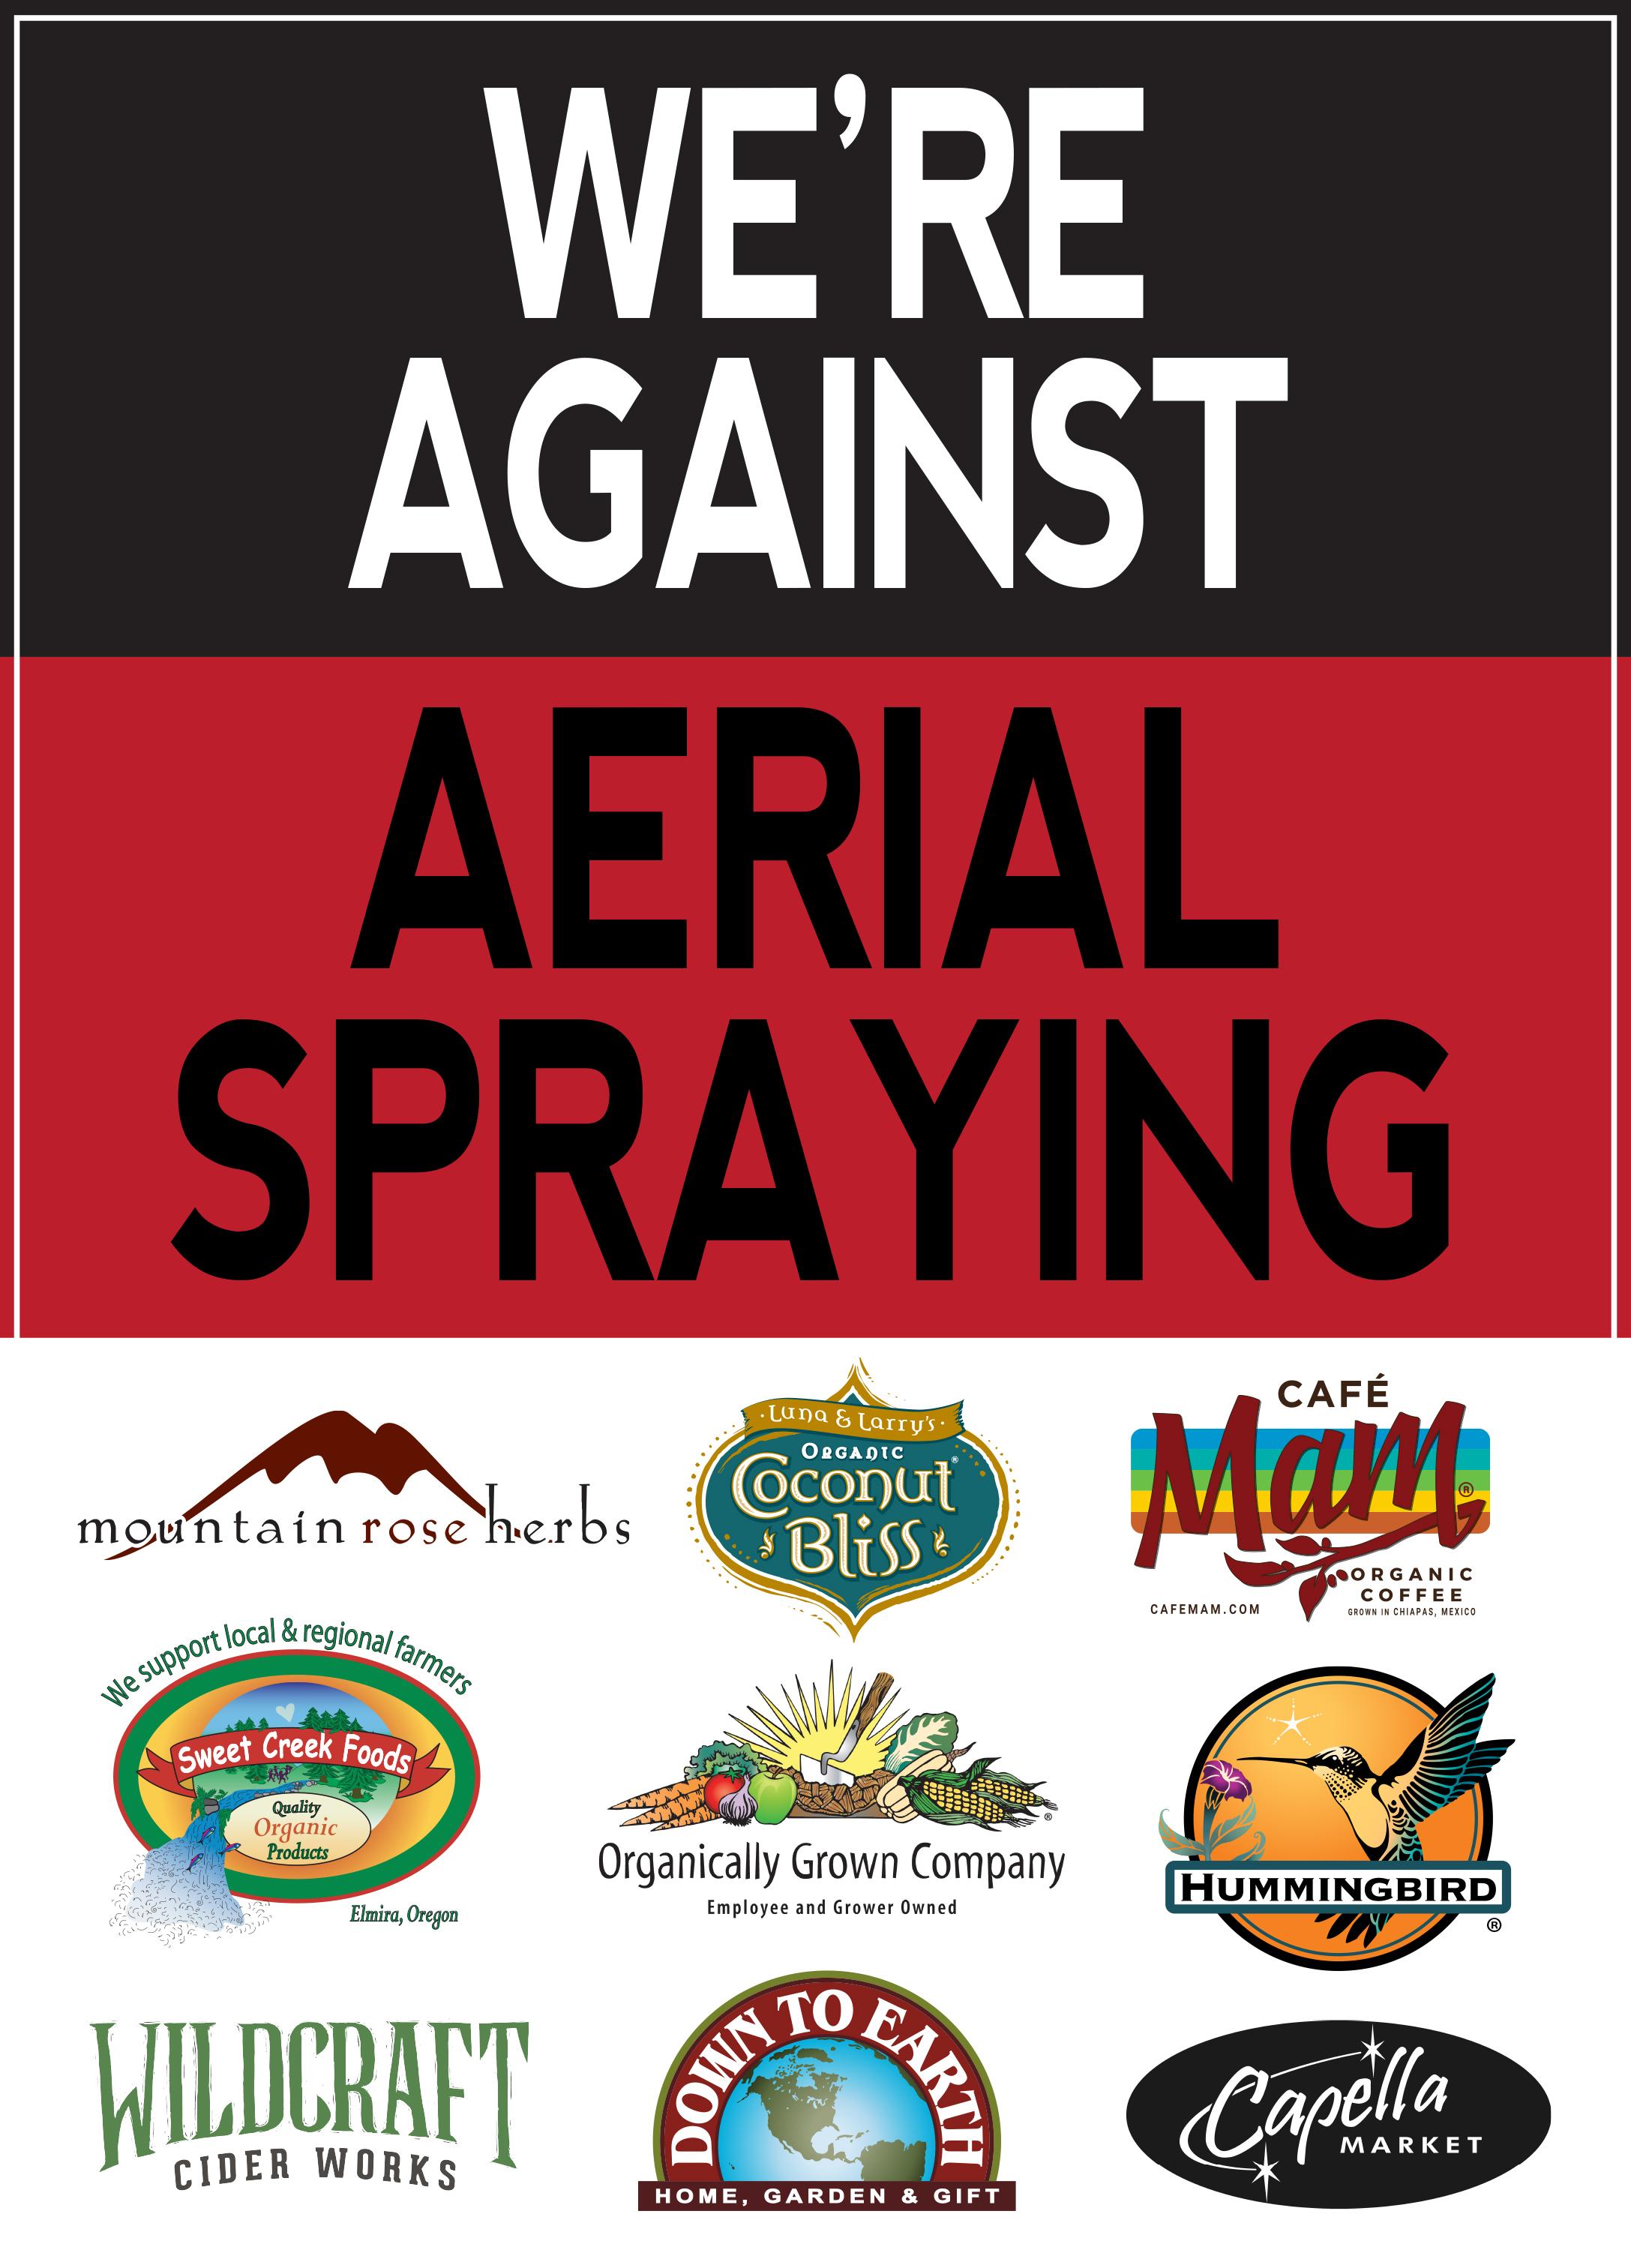 AgainstAerialSpraying_EugeneWeekly.jpg